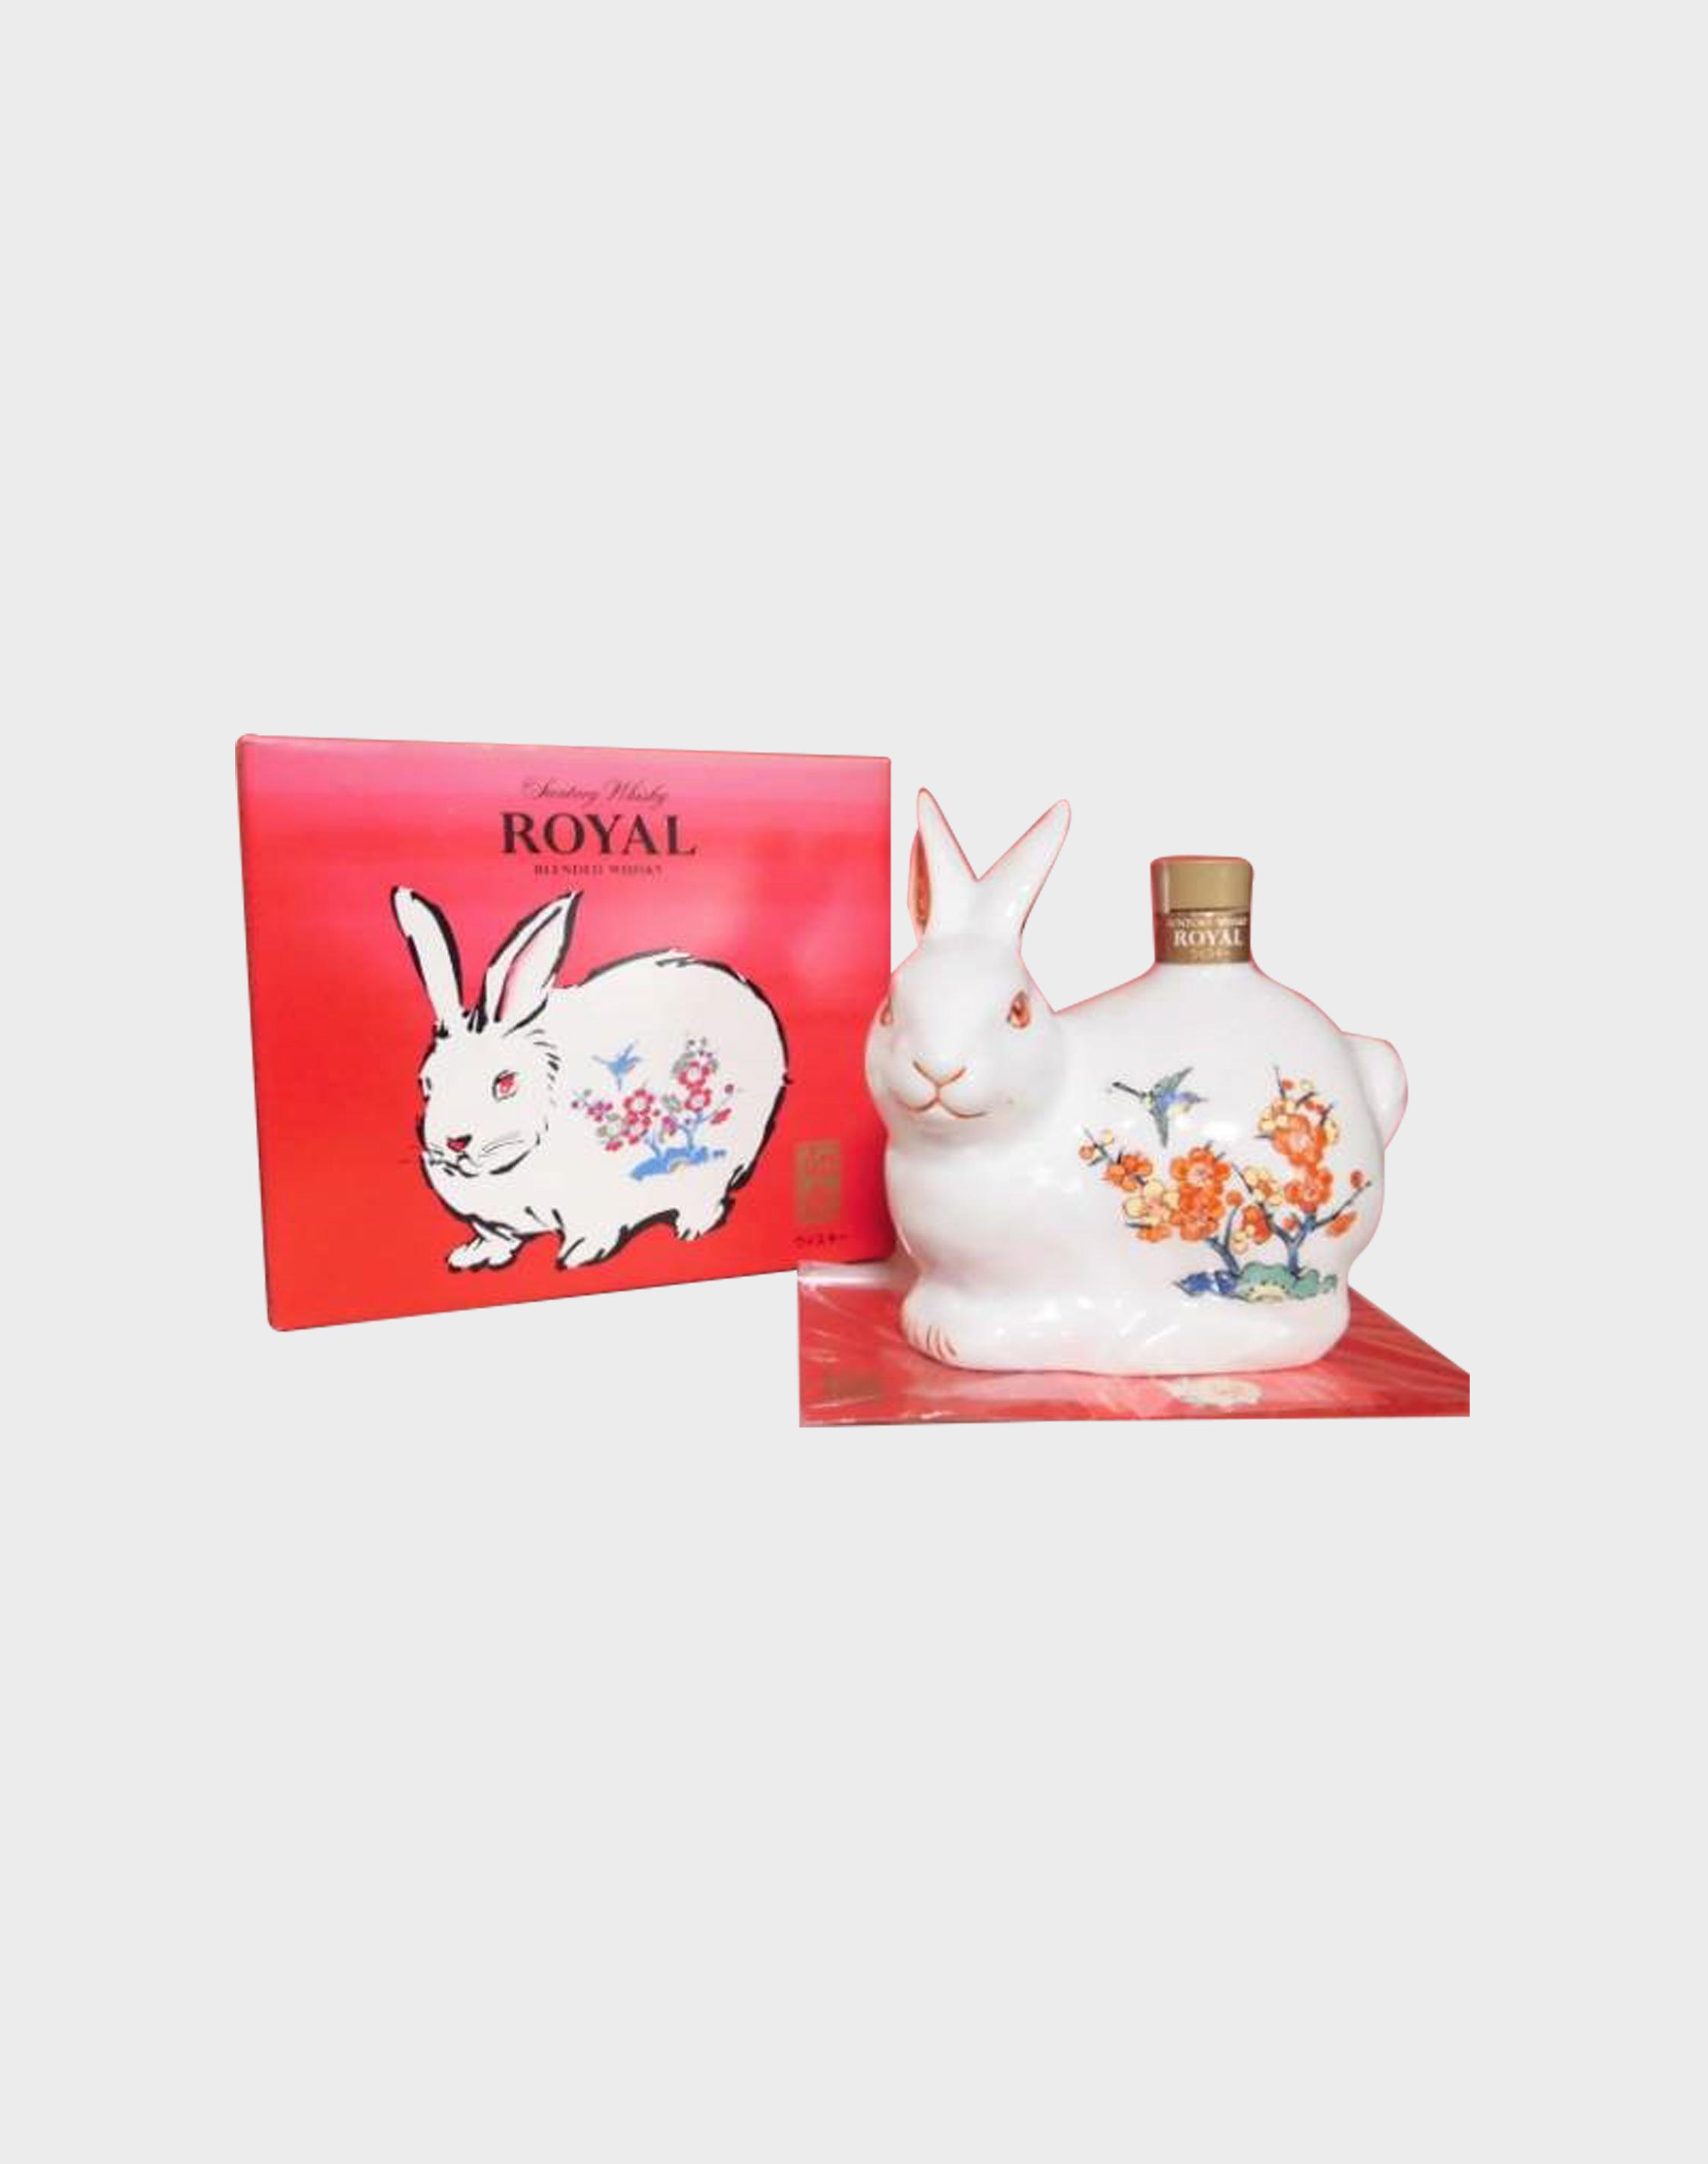 Suntory Royal Whisky Year 2011 Rabbit